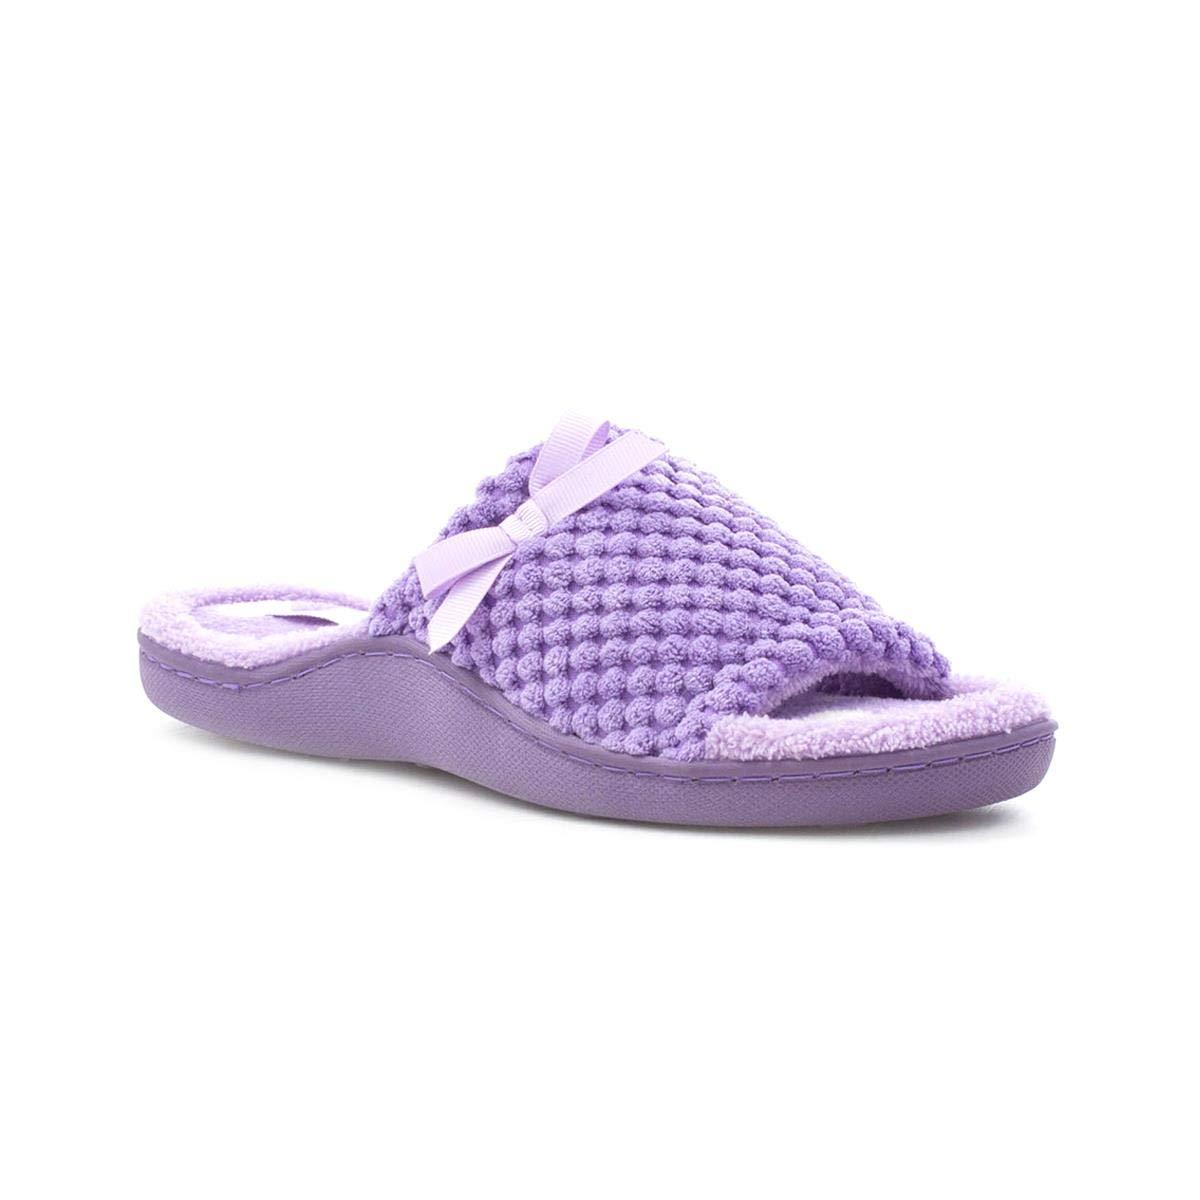 The Slipper Company Womens Lilac Mule Slipper